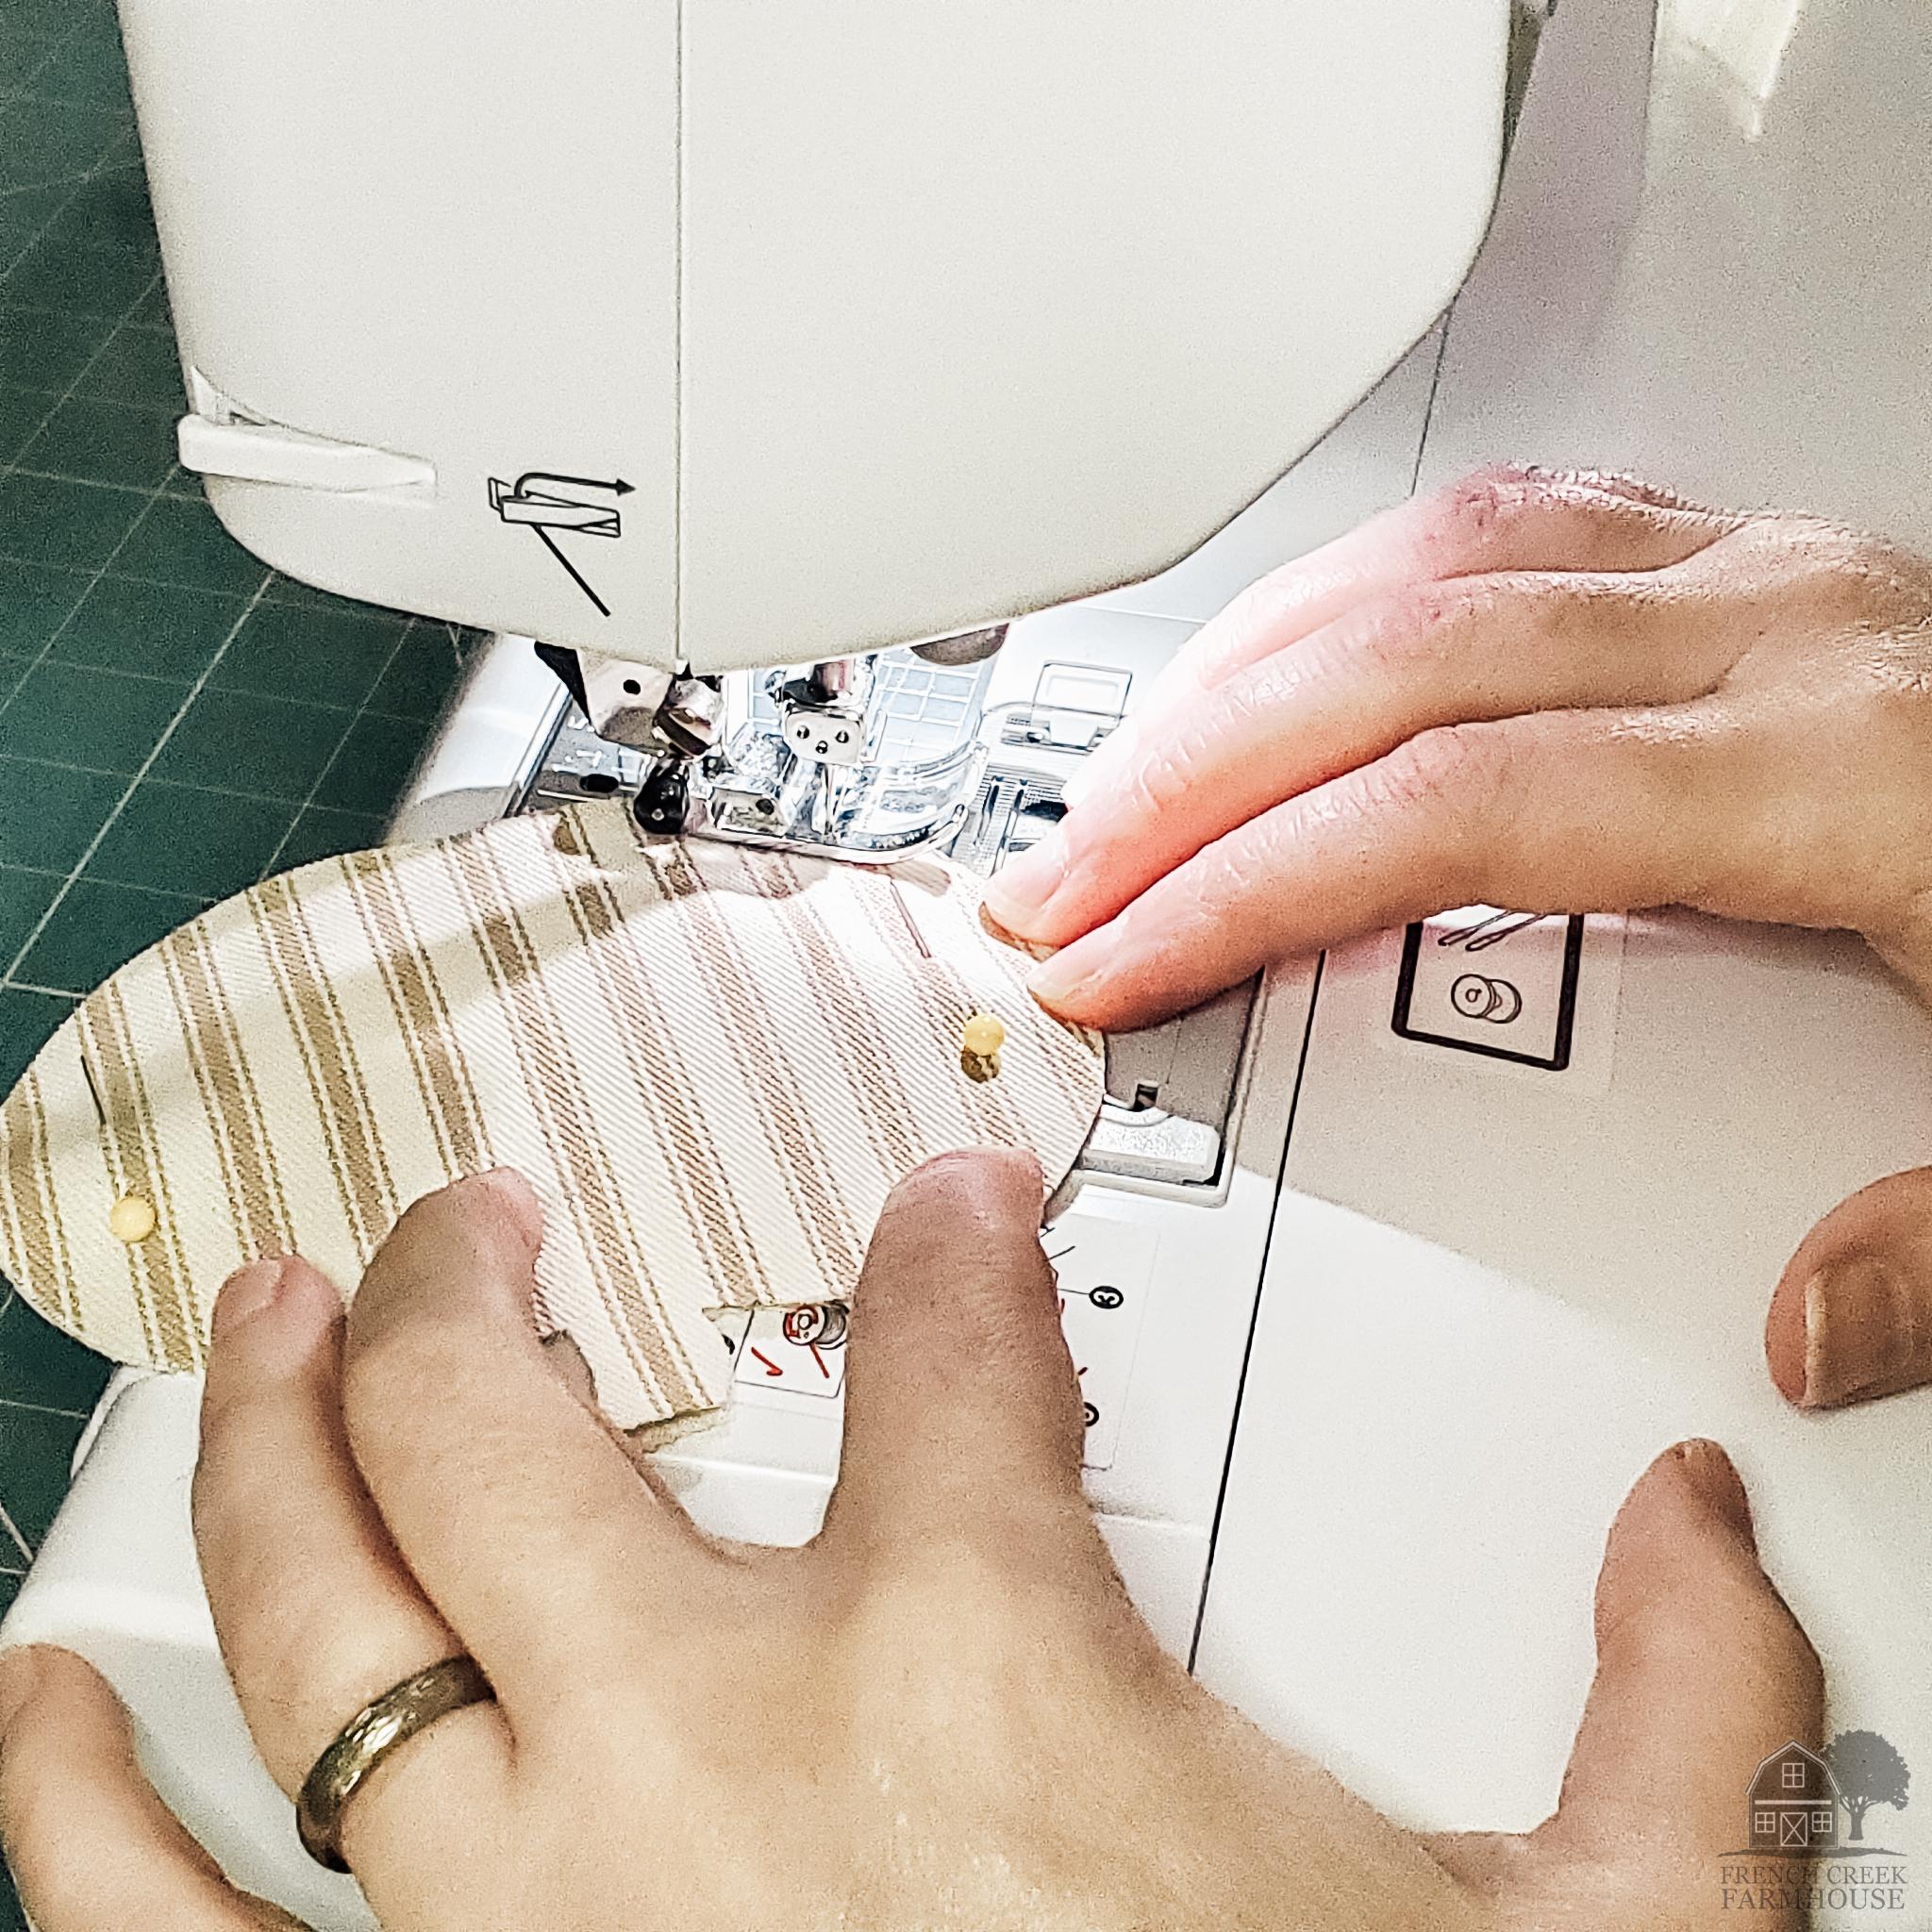 Top-stitching around the edges